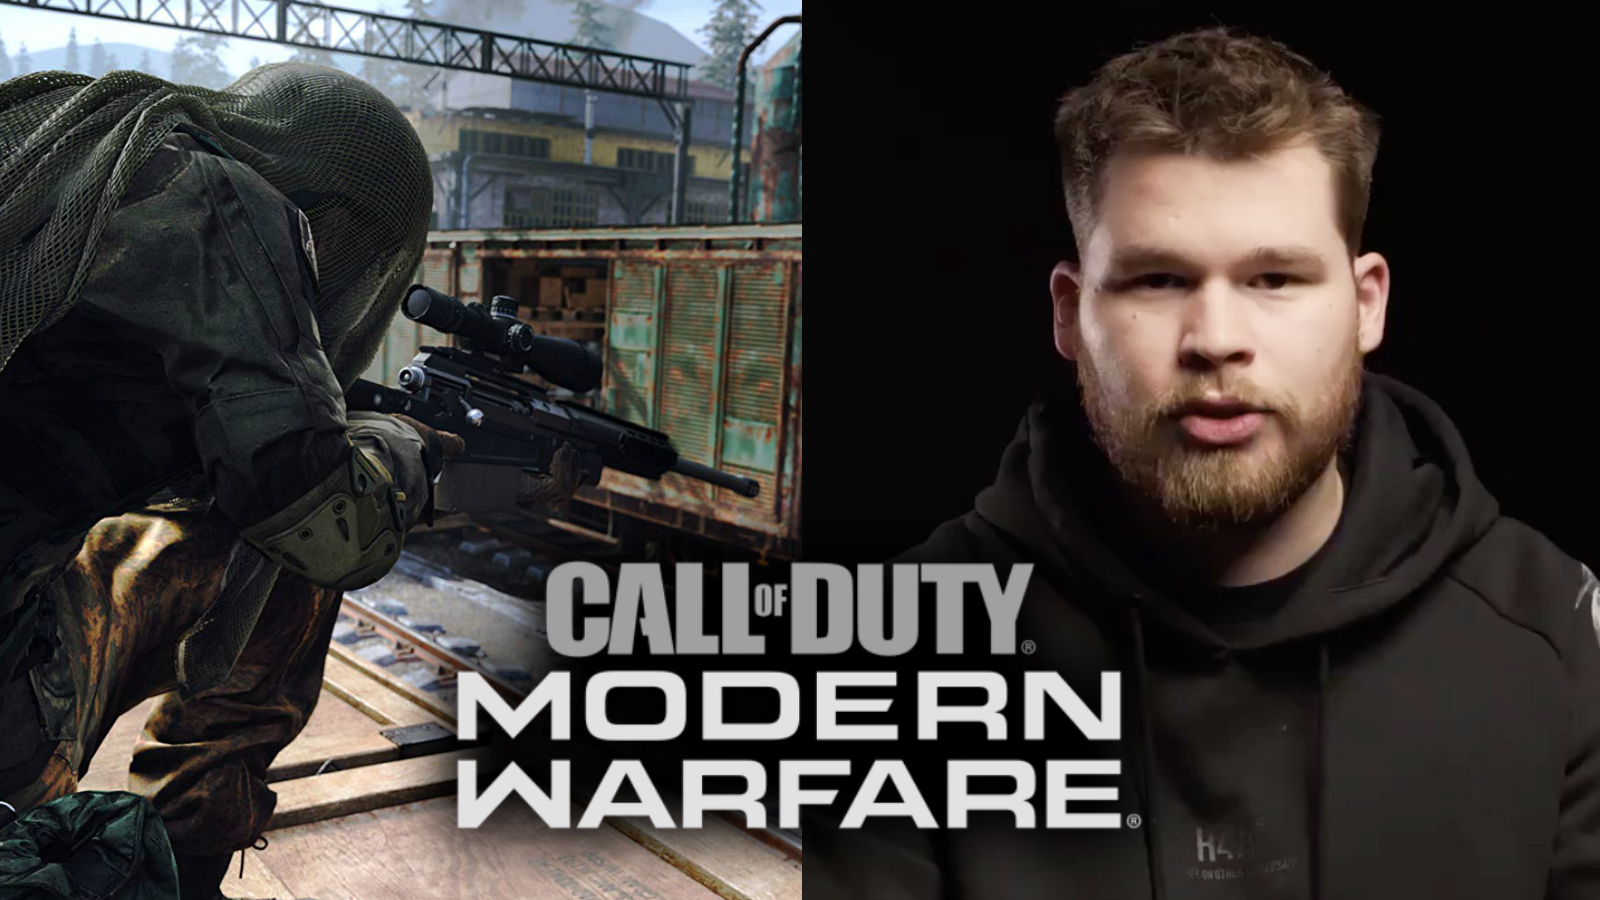 modern warfare sniper next to professional player crimsix in a black hoody